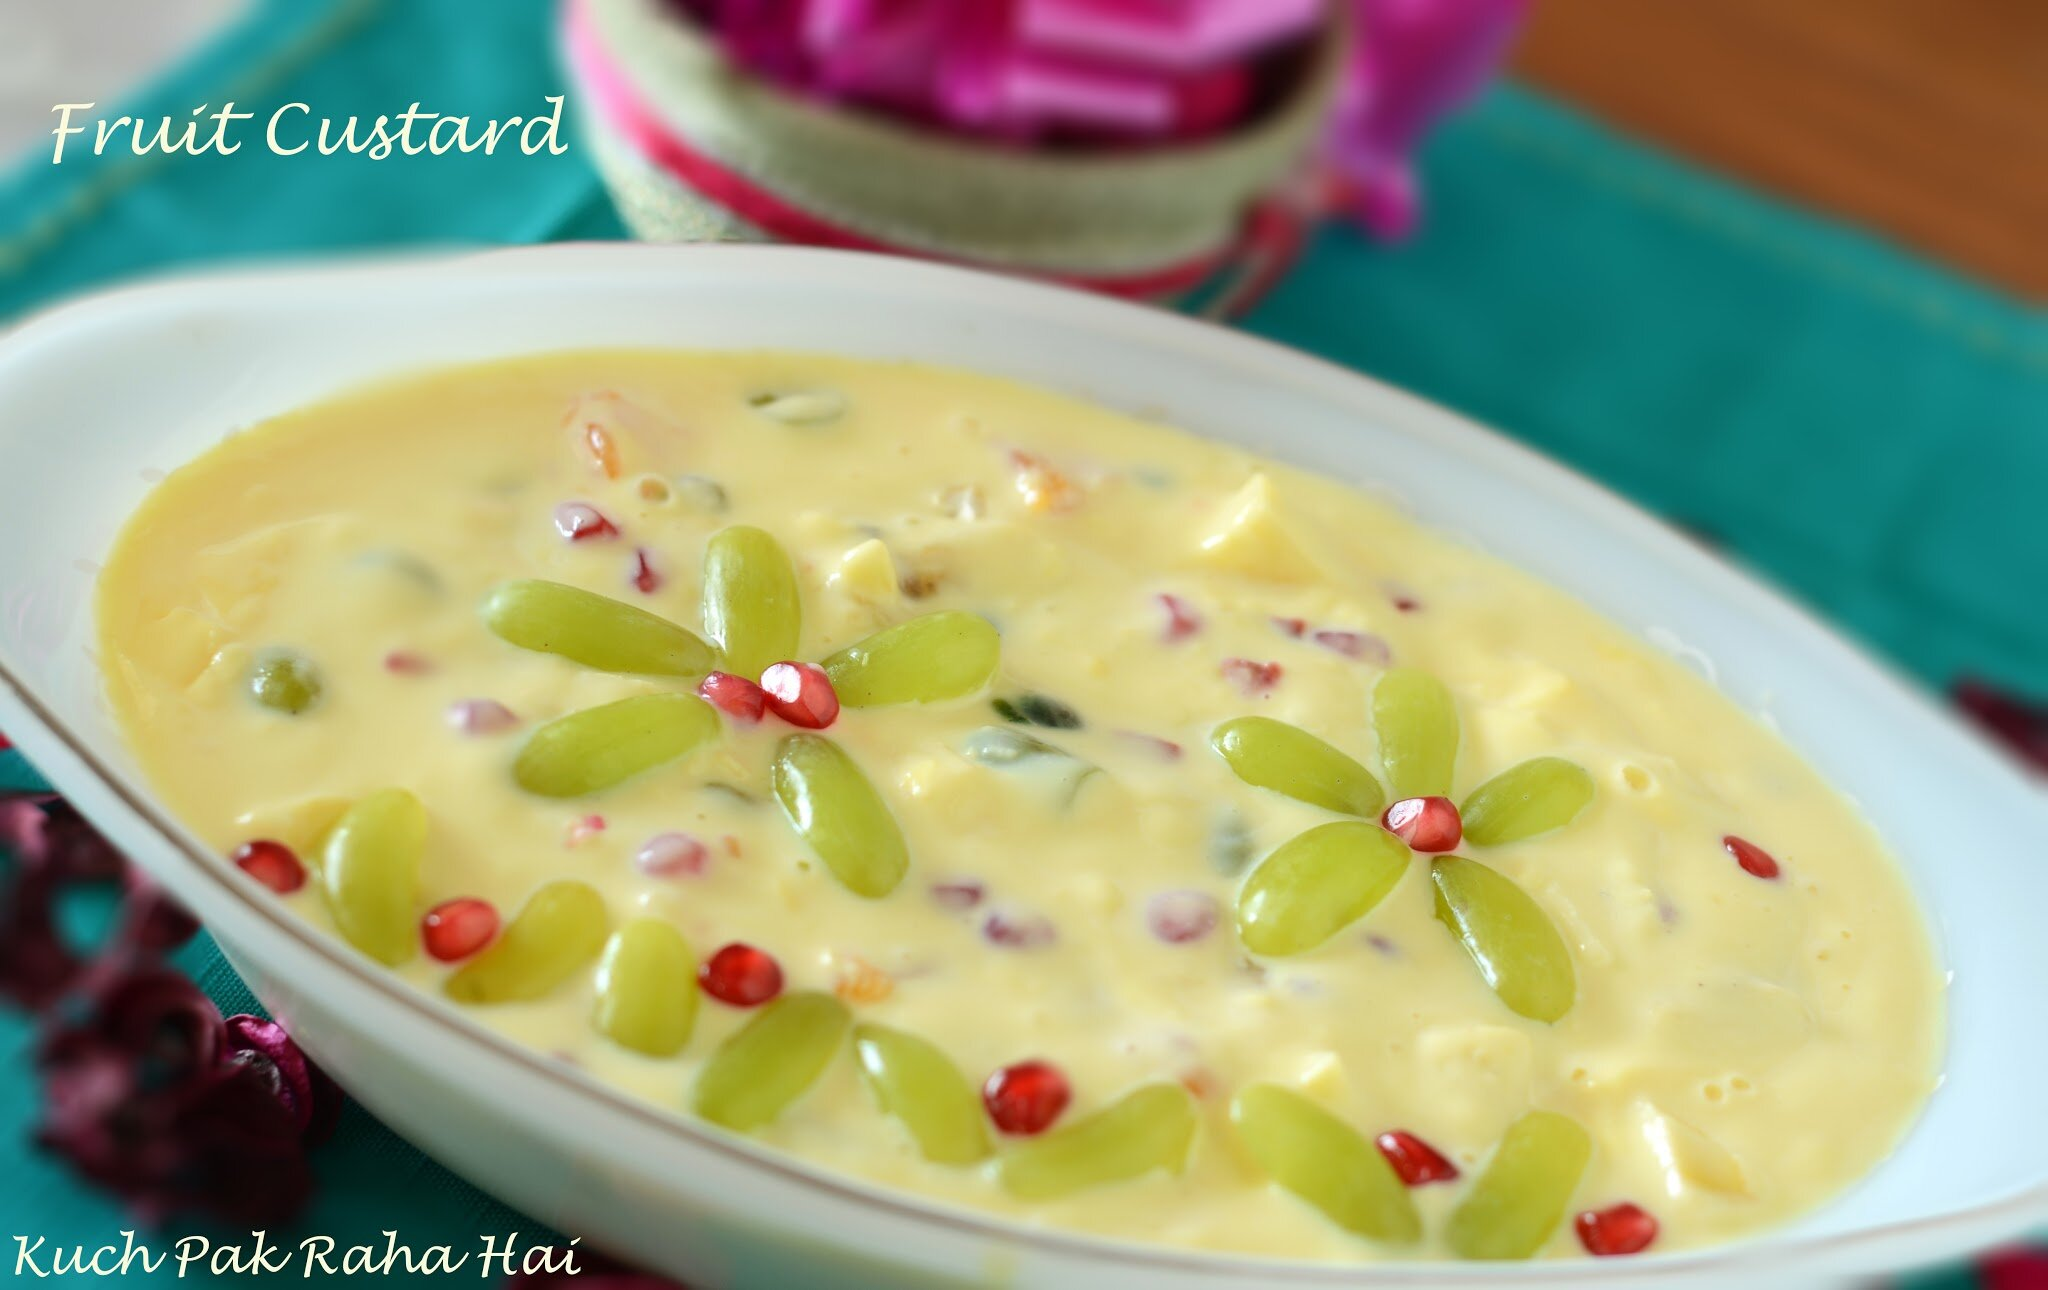 Fruit Custard Recipe Summer Dessert